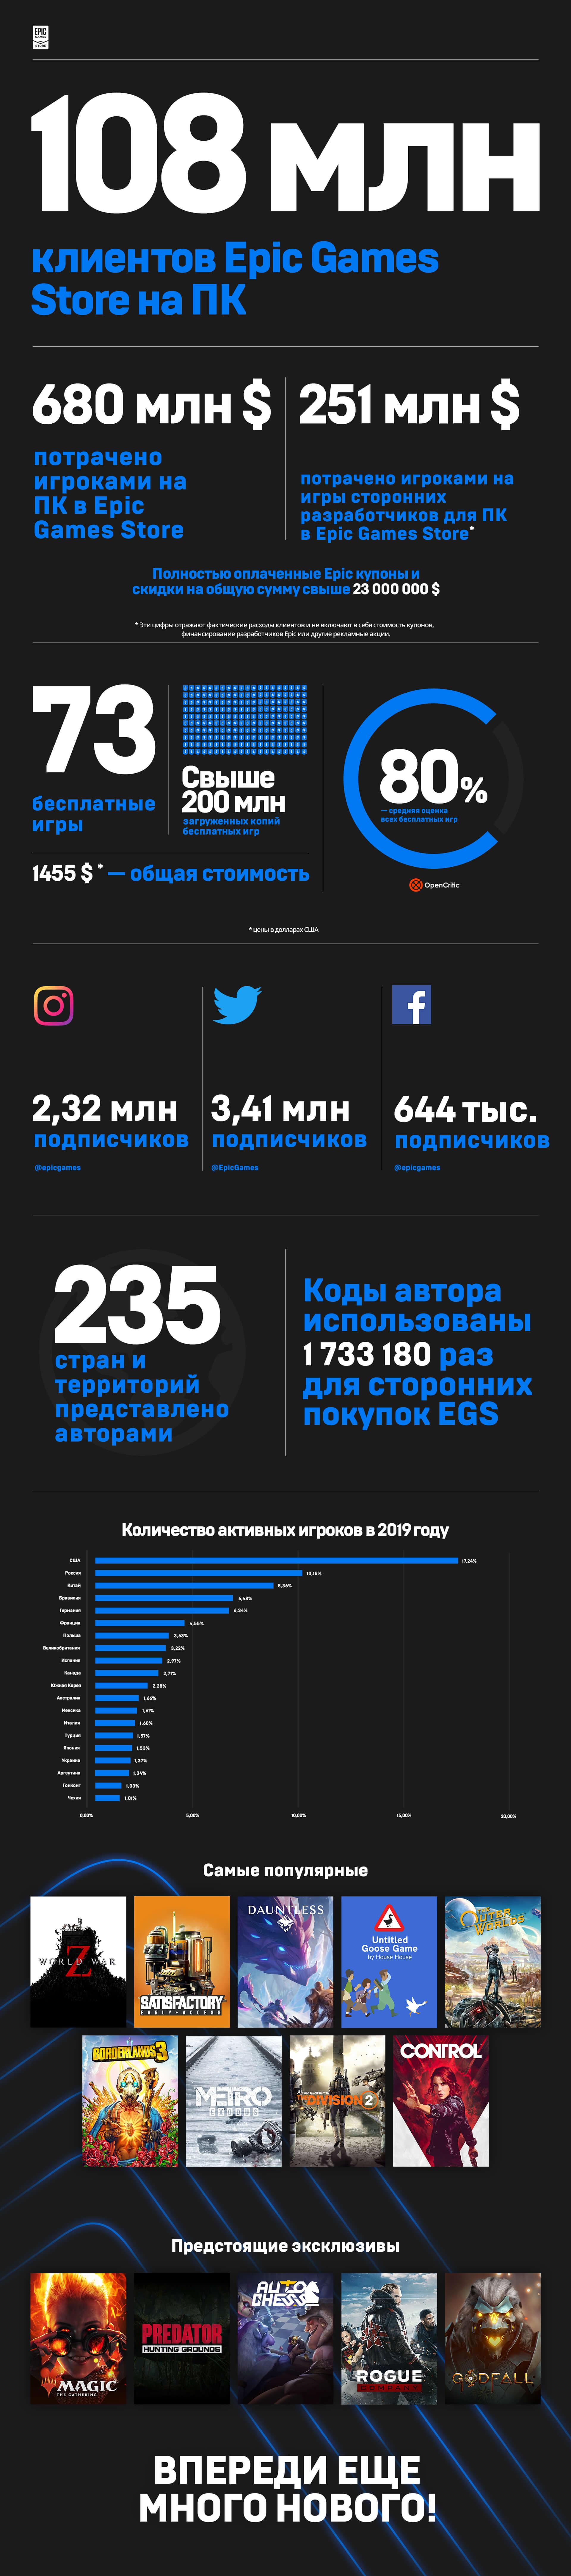 RU_EGS_Infographic.jpg